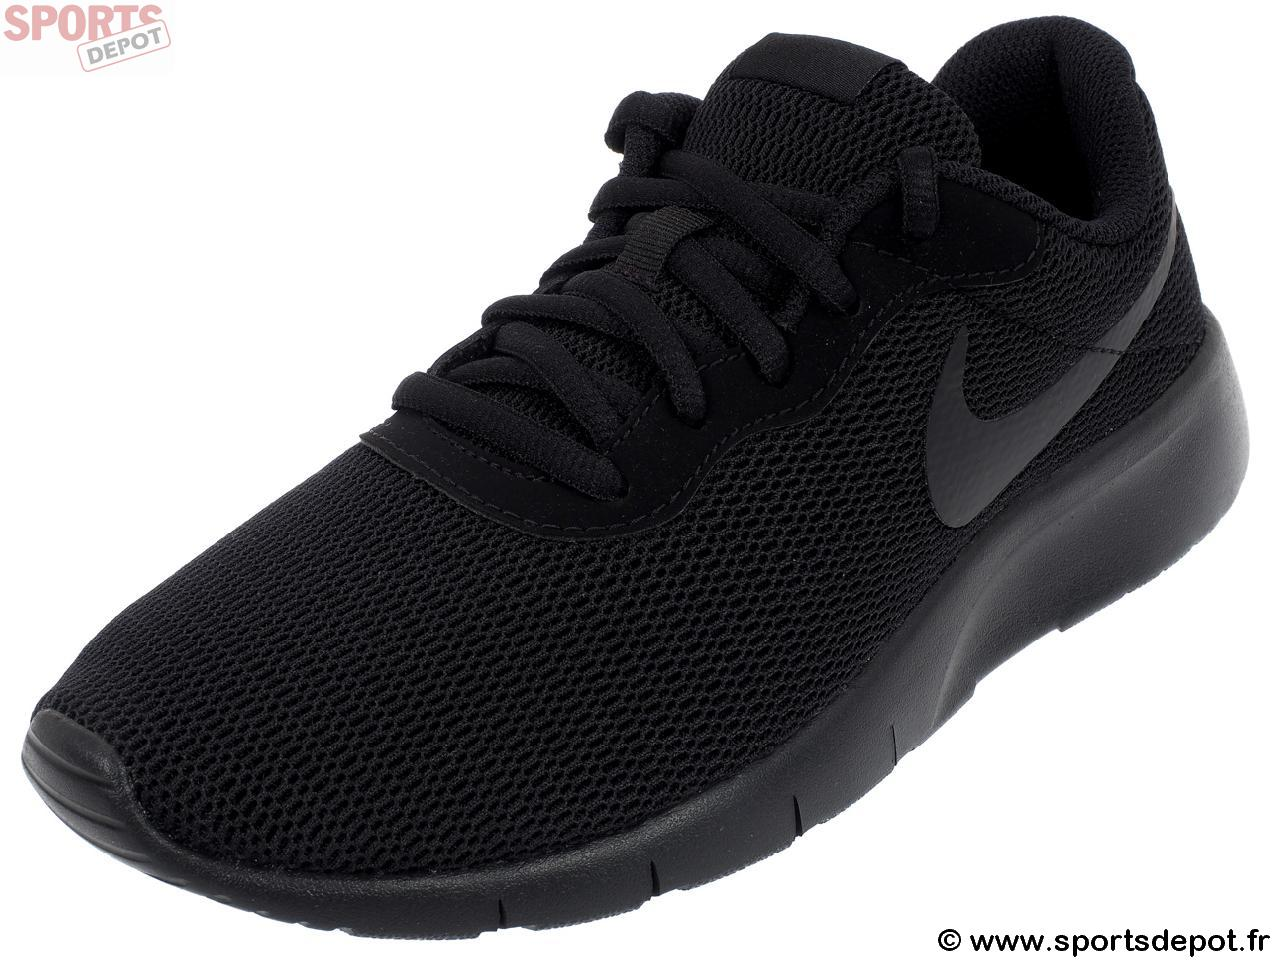 fce7ddacd16eb Acheter Chaussures running mode NIKE Tanjun jr noir noir - Enfant ...